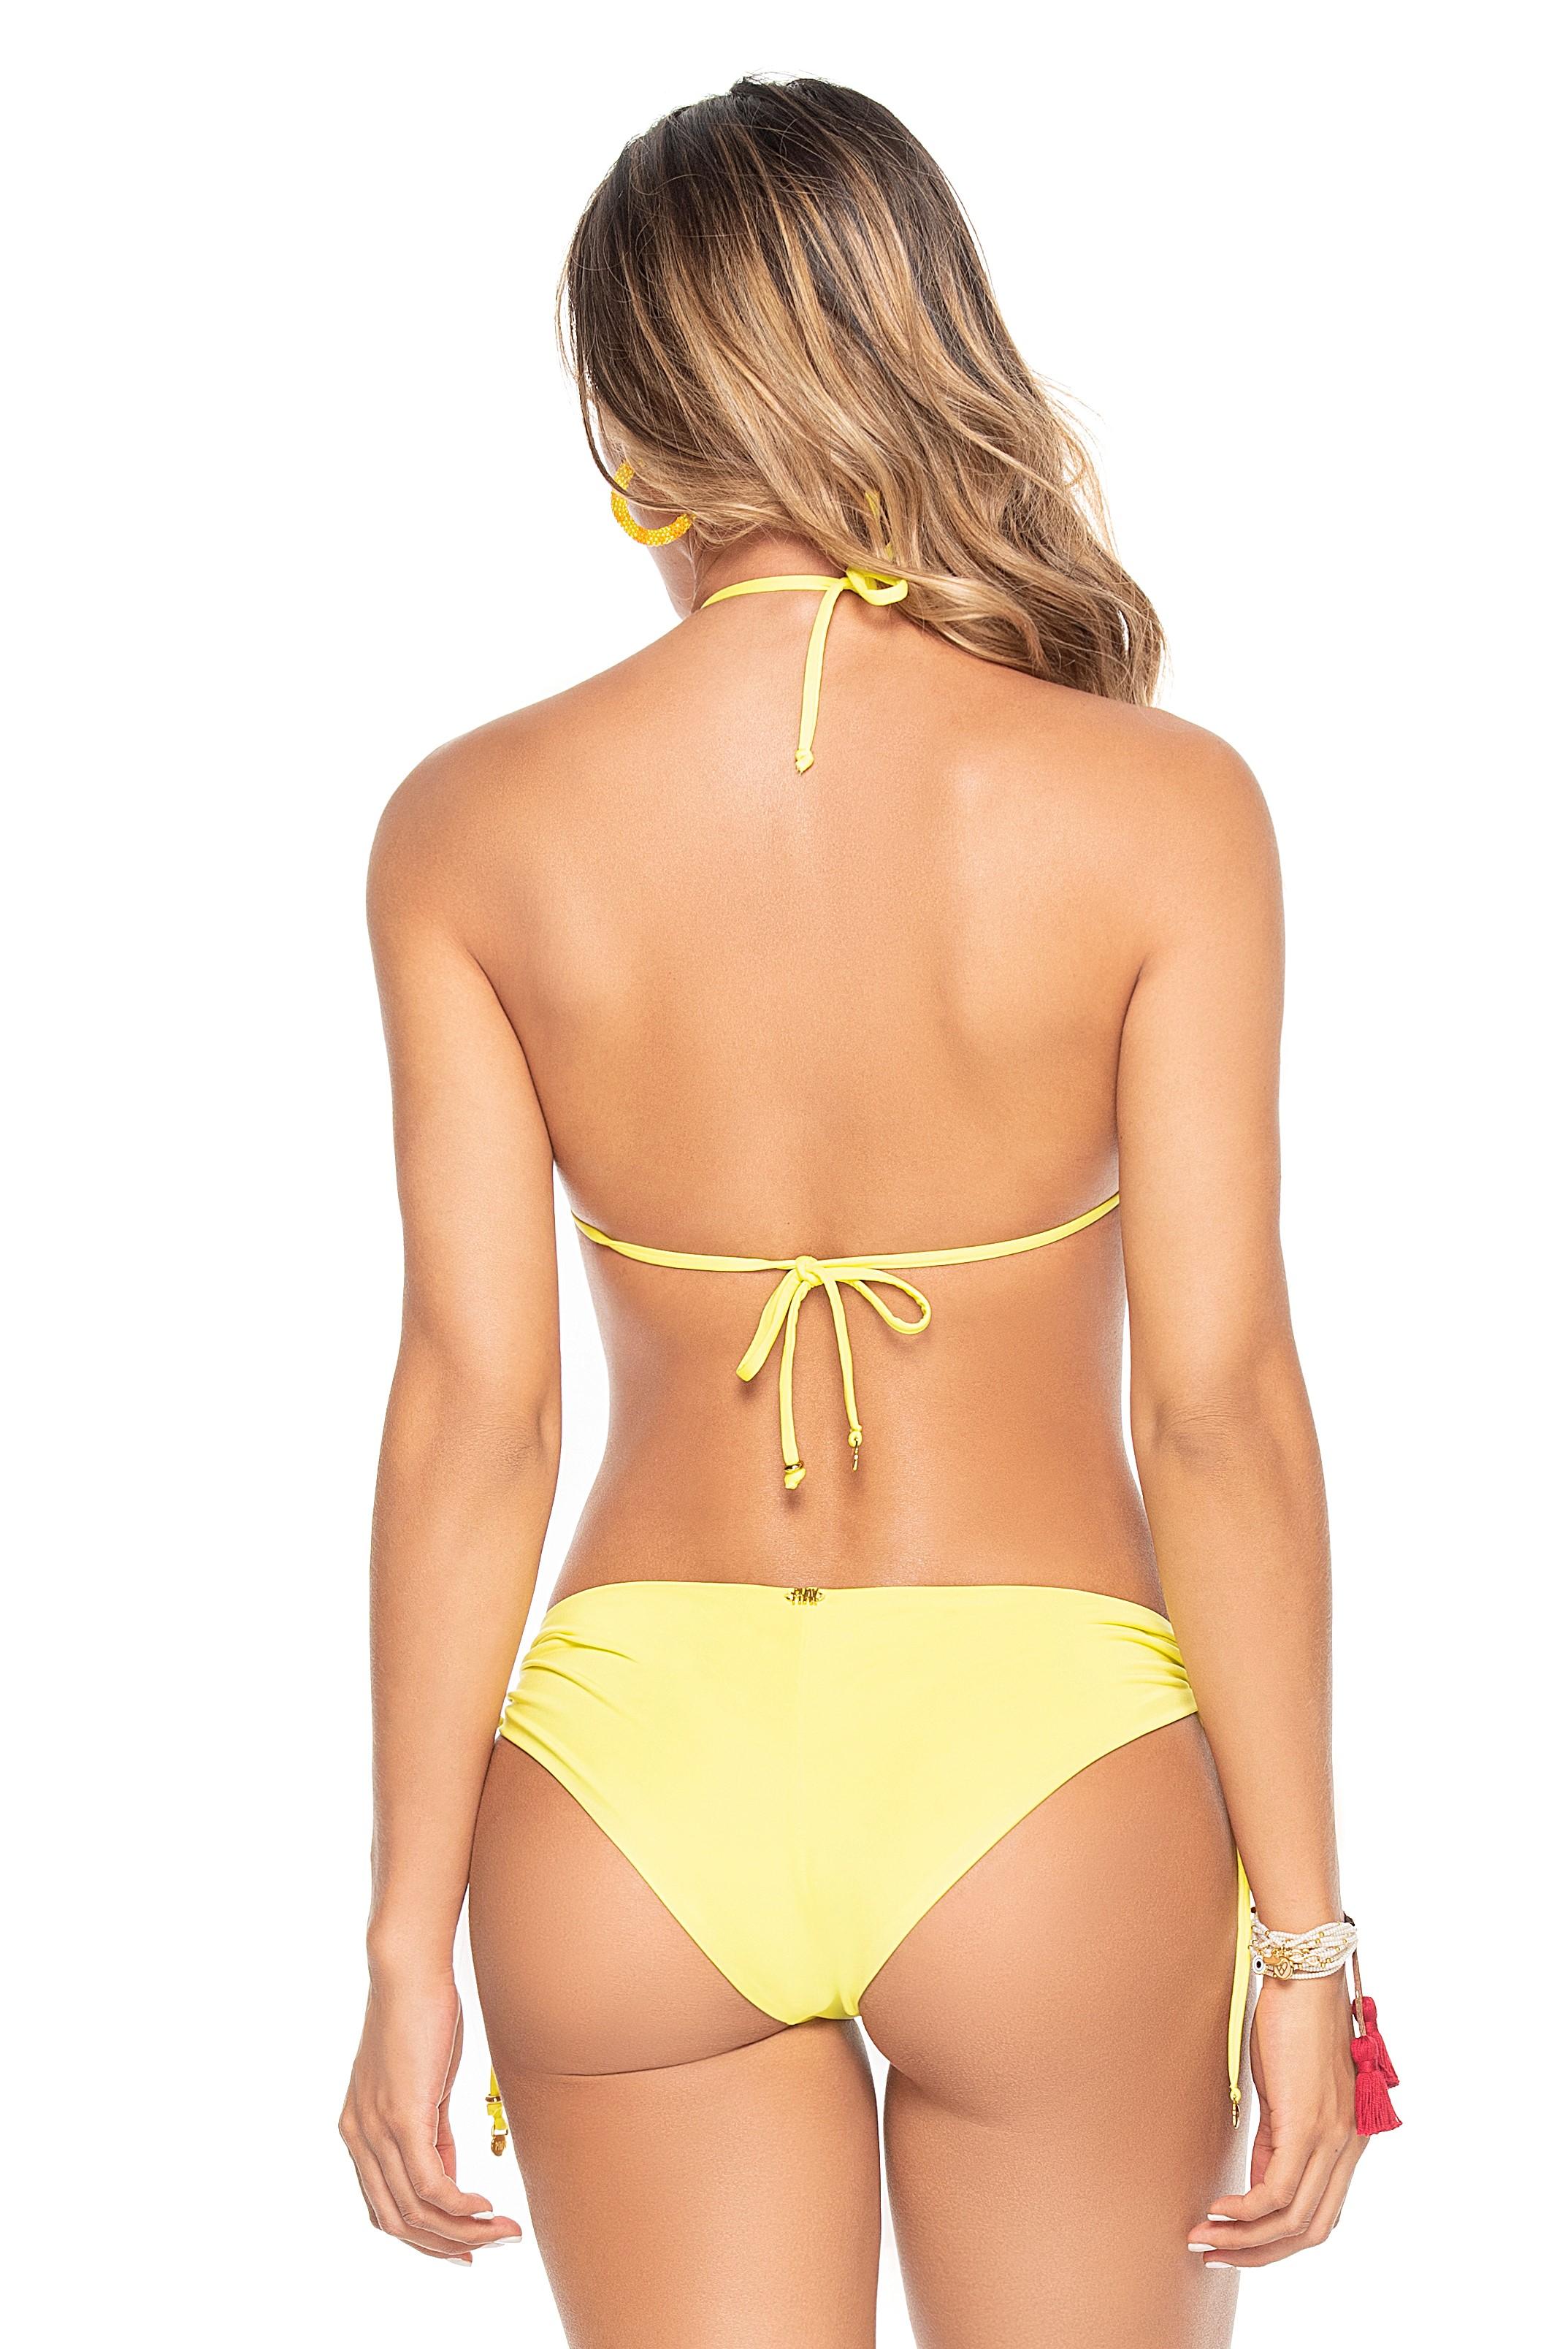 Phax Mimosa Gele Triangel Bikini